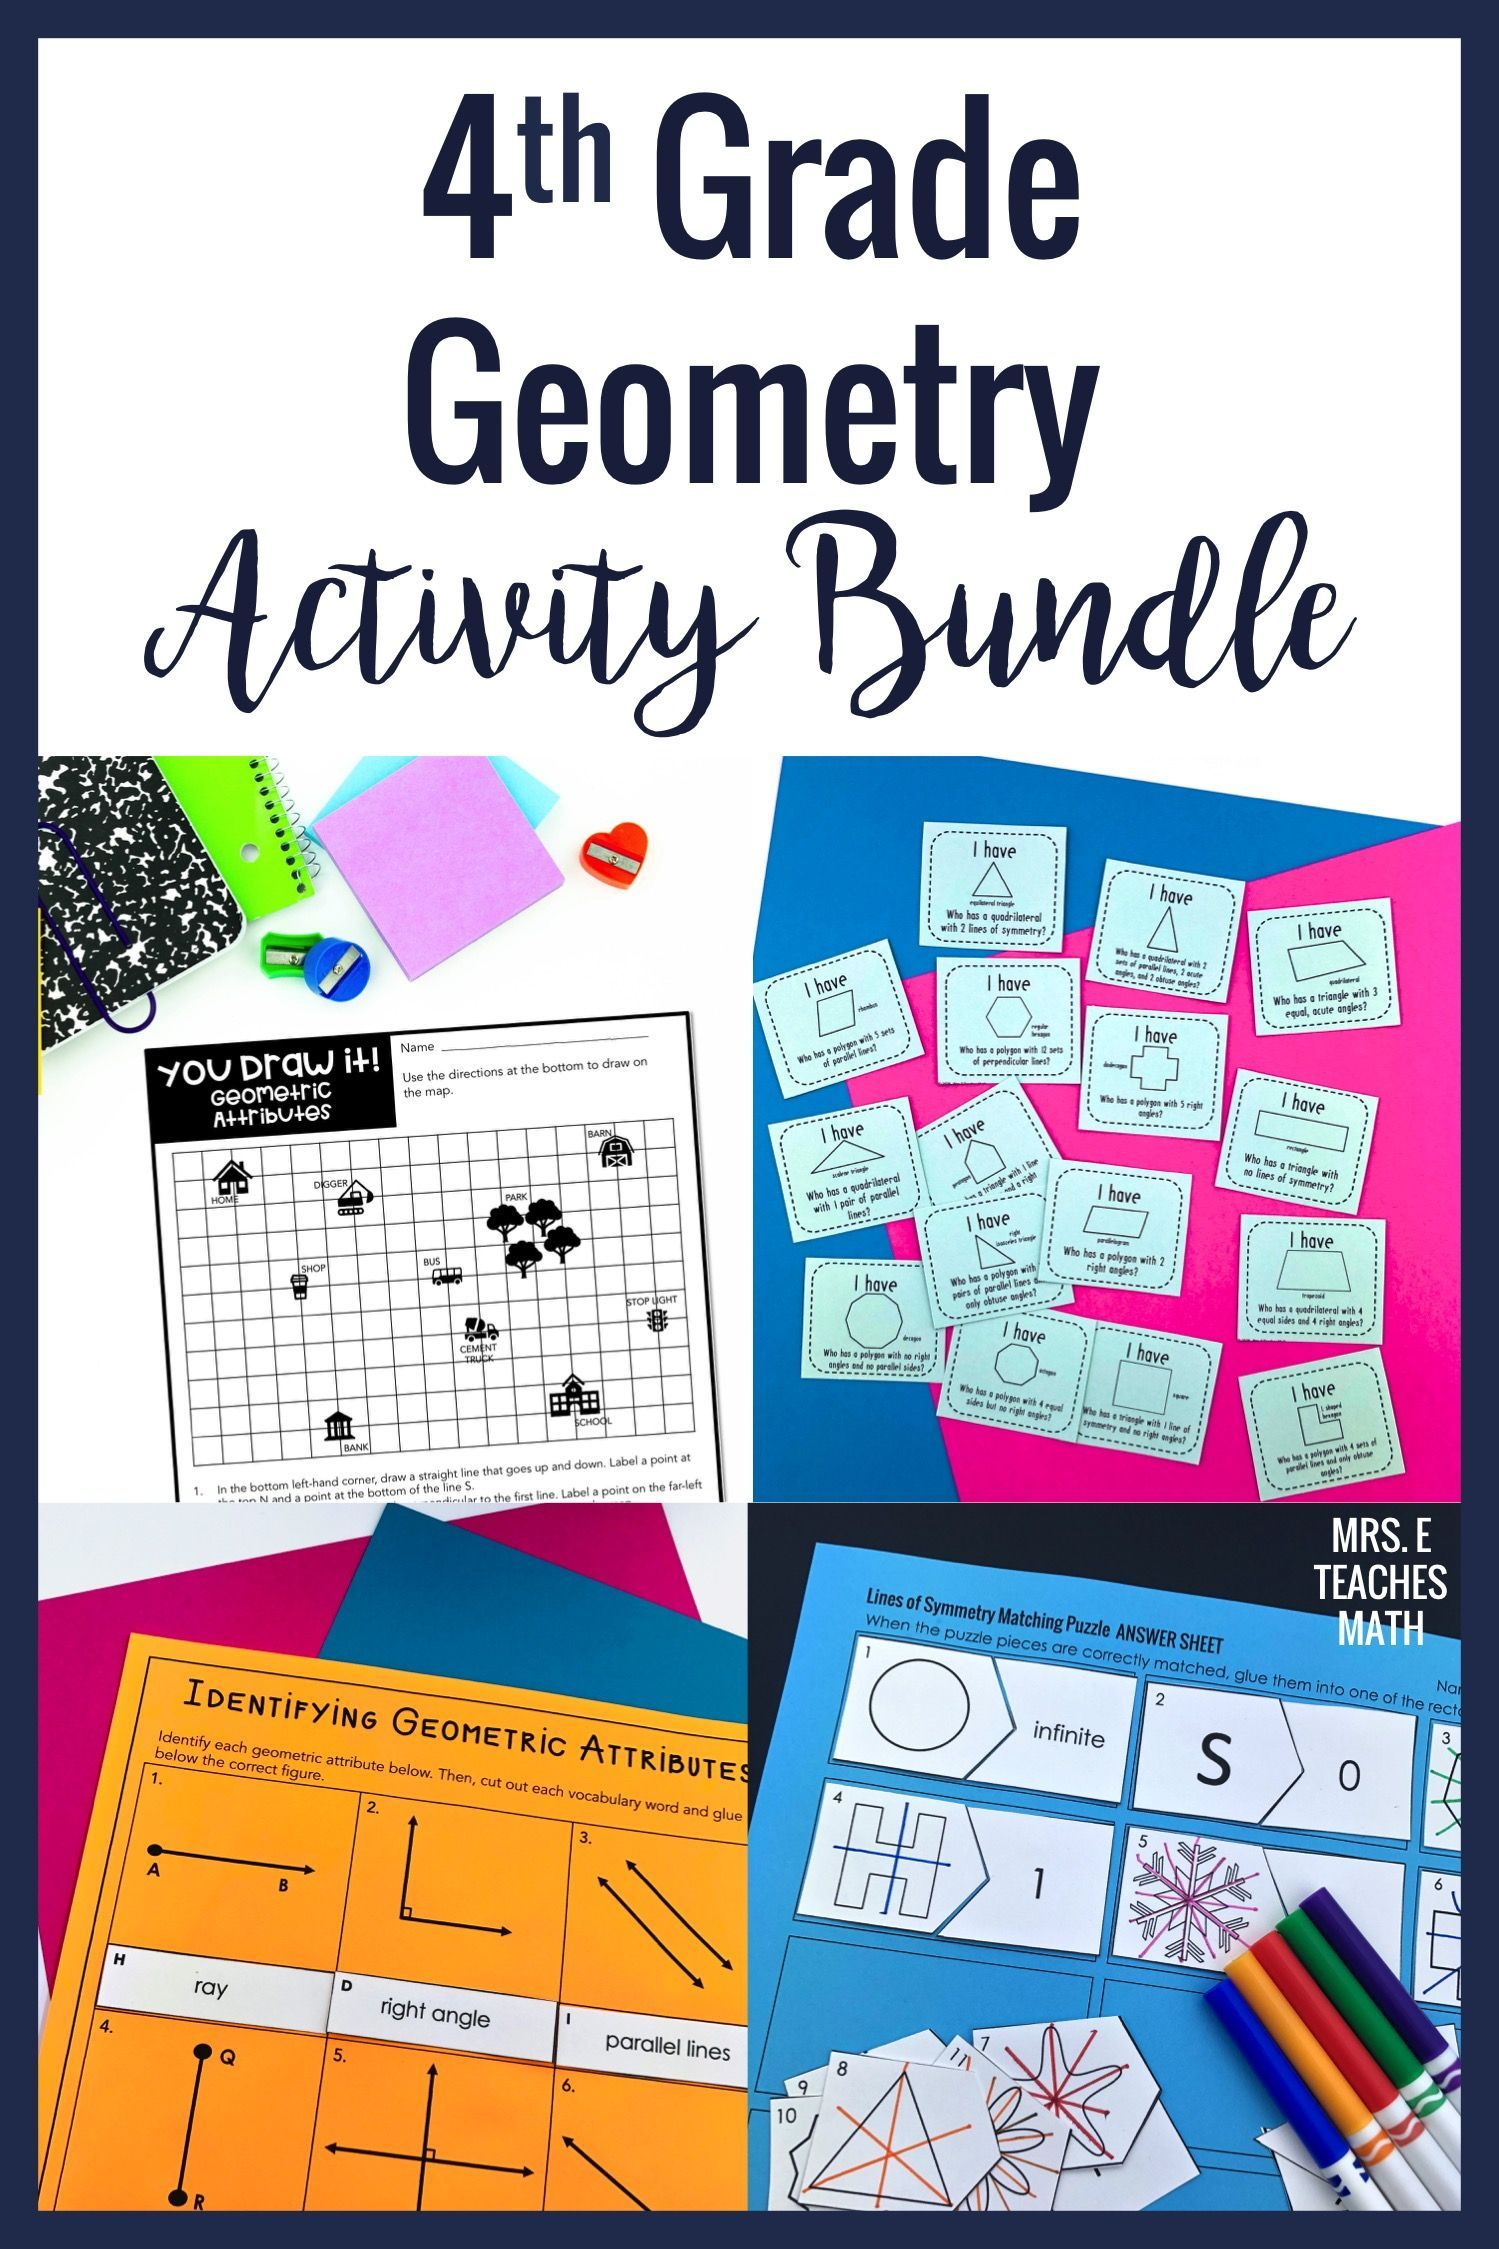 4th Grade Geometry Activity Bundle 4.G in 2020 Teaching